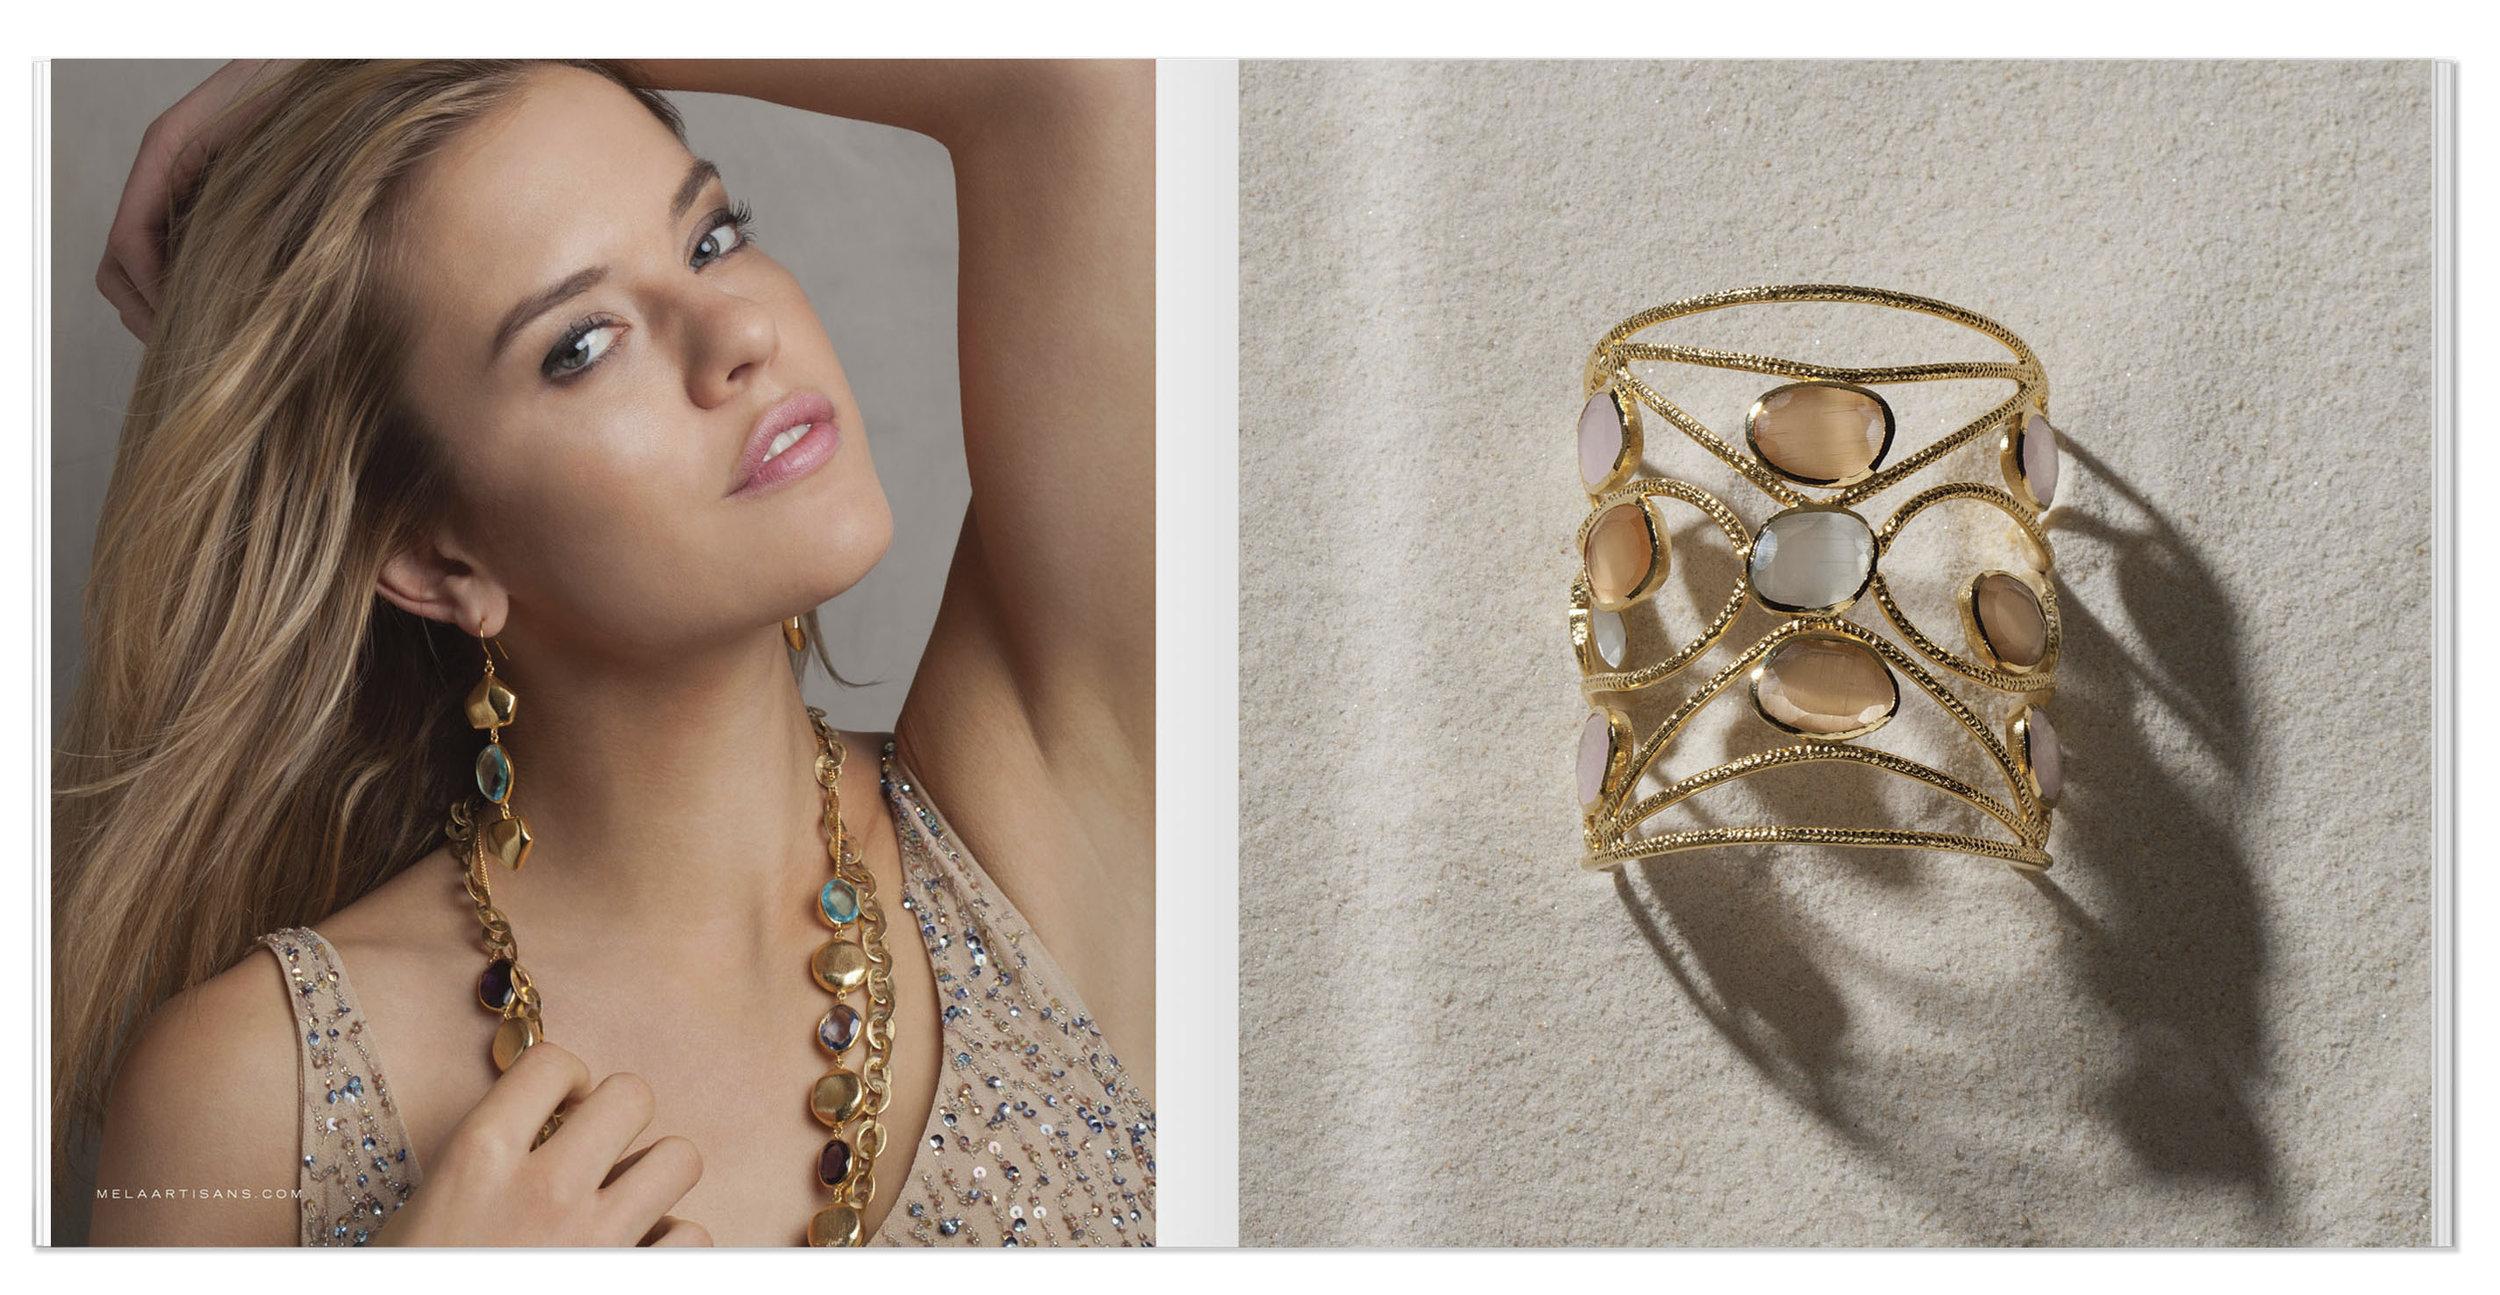 melajewelry_spd_2.jpg